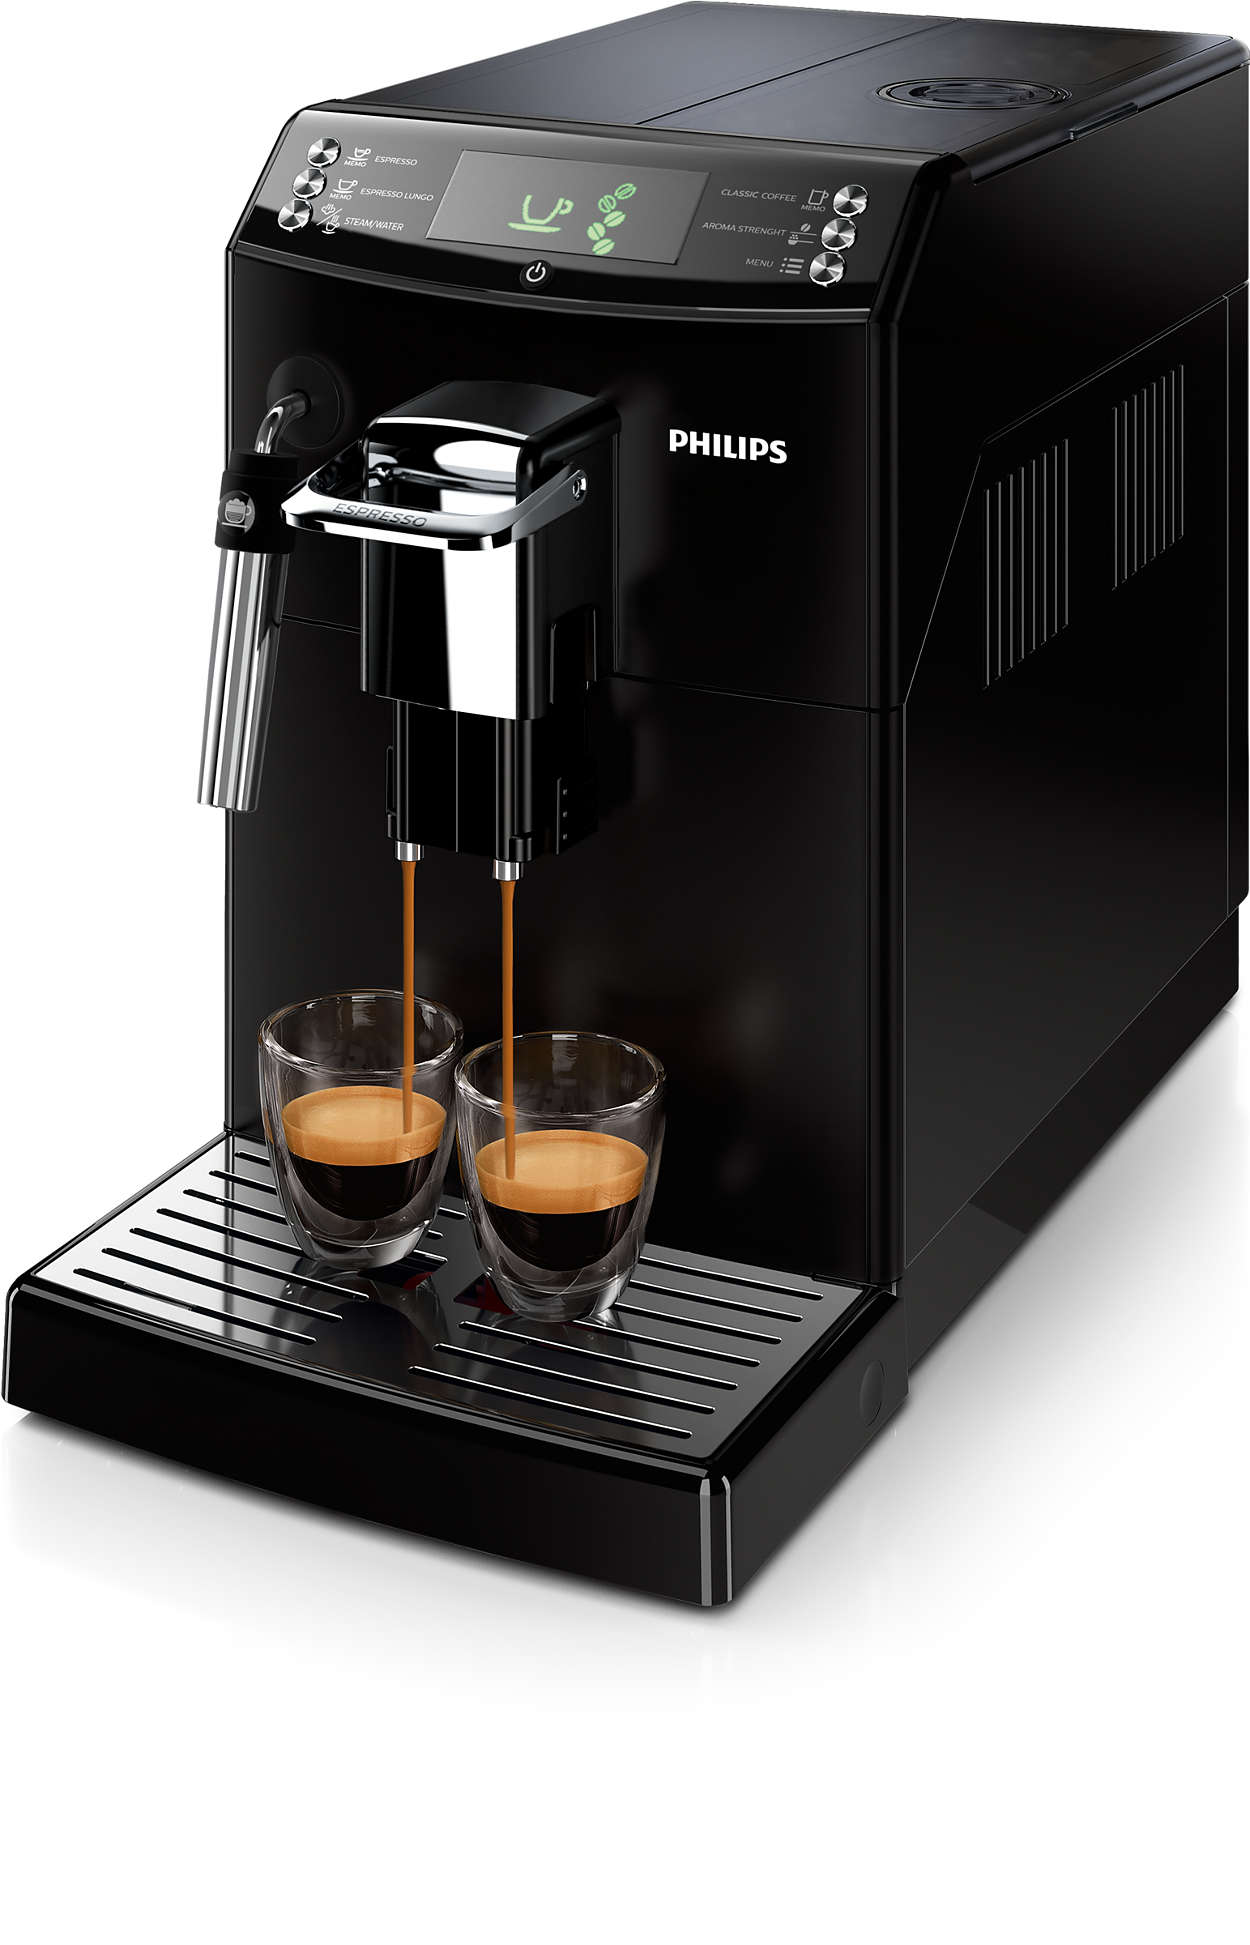 Óptimo café expresso e o sabor do café de filtro